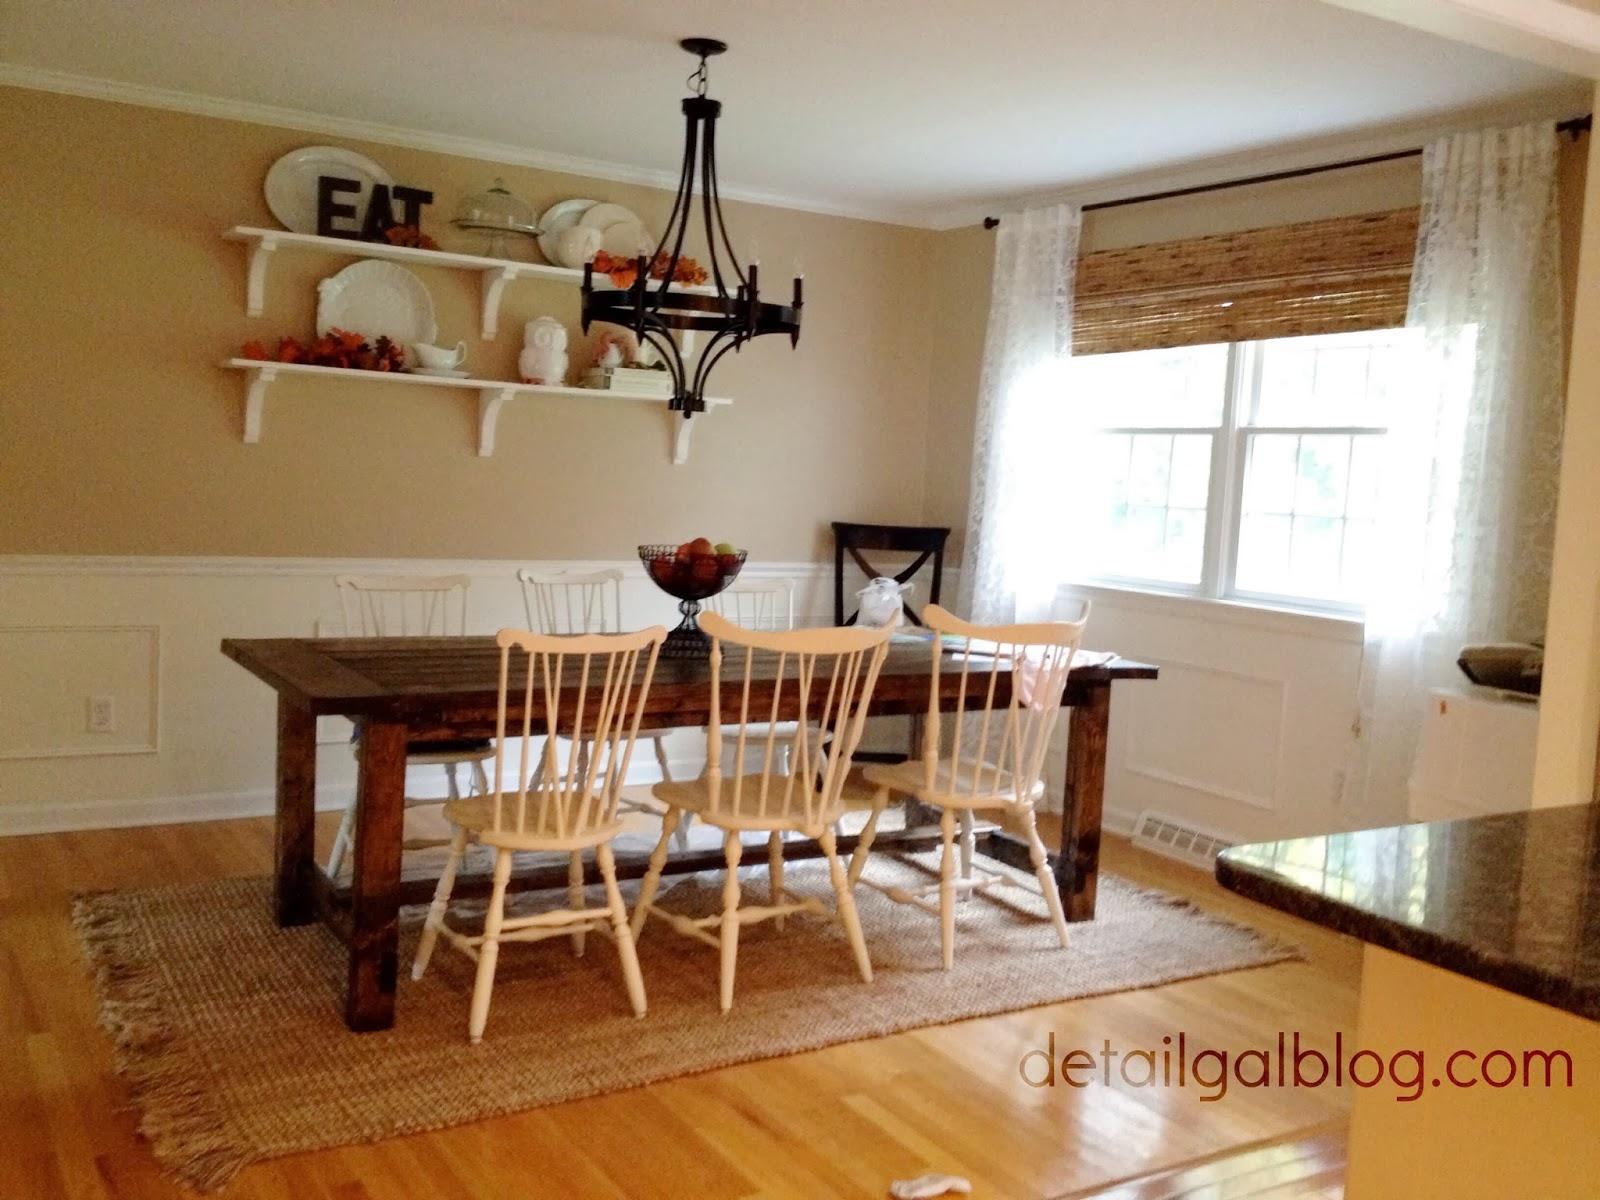 diy shelves for dining room shelf rugs under kitchen table DIY Shelves for Dining Room Shelf styling